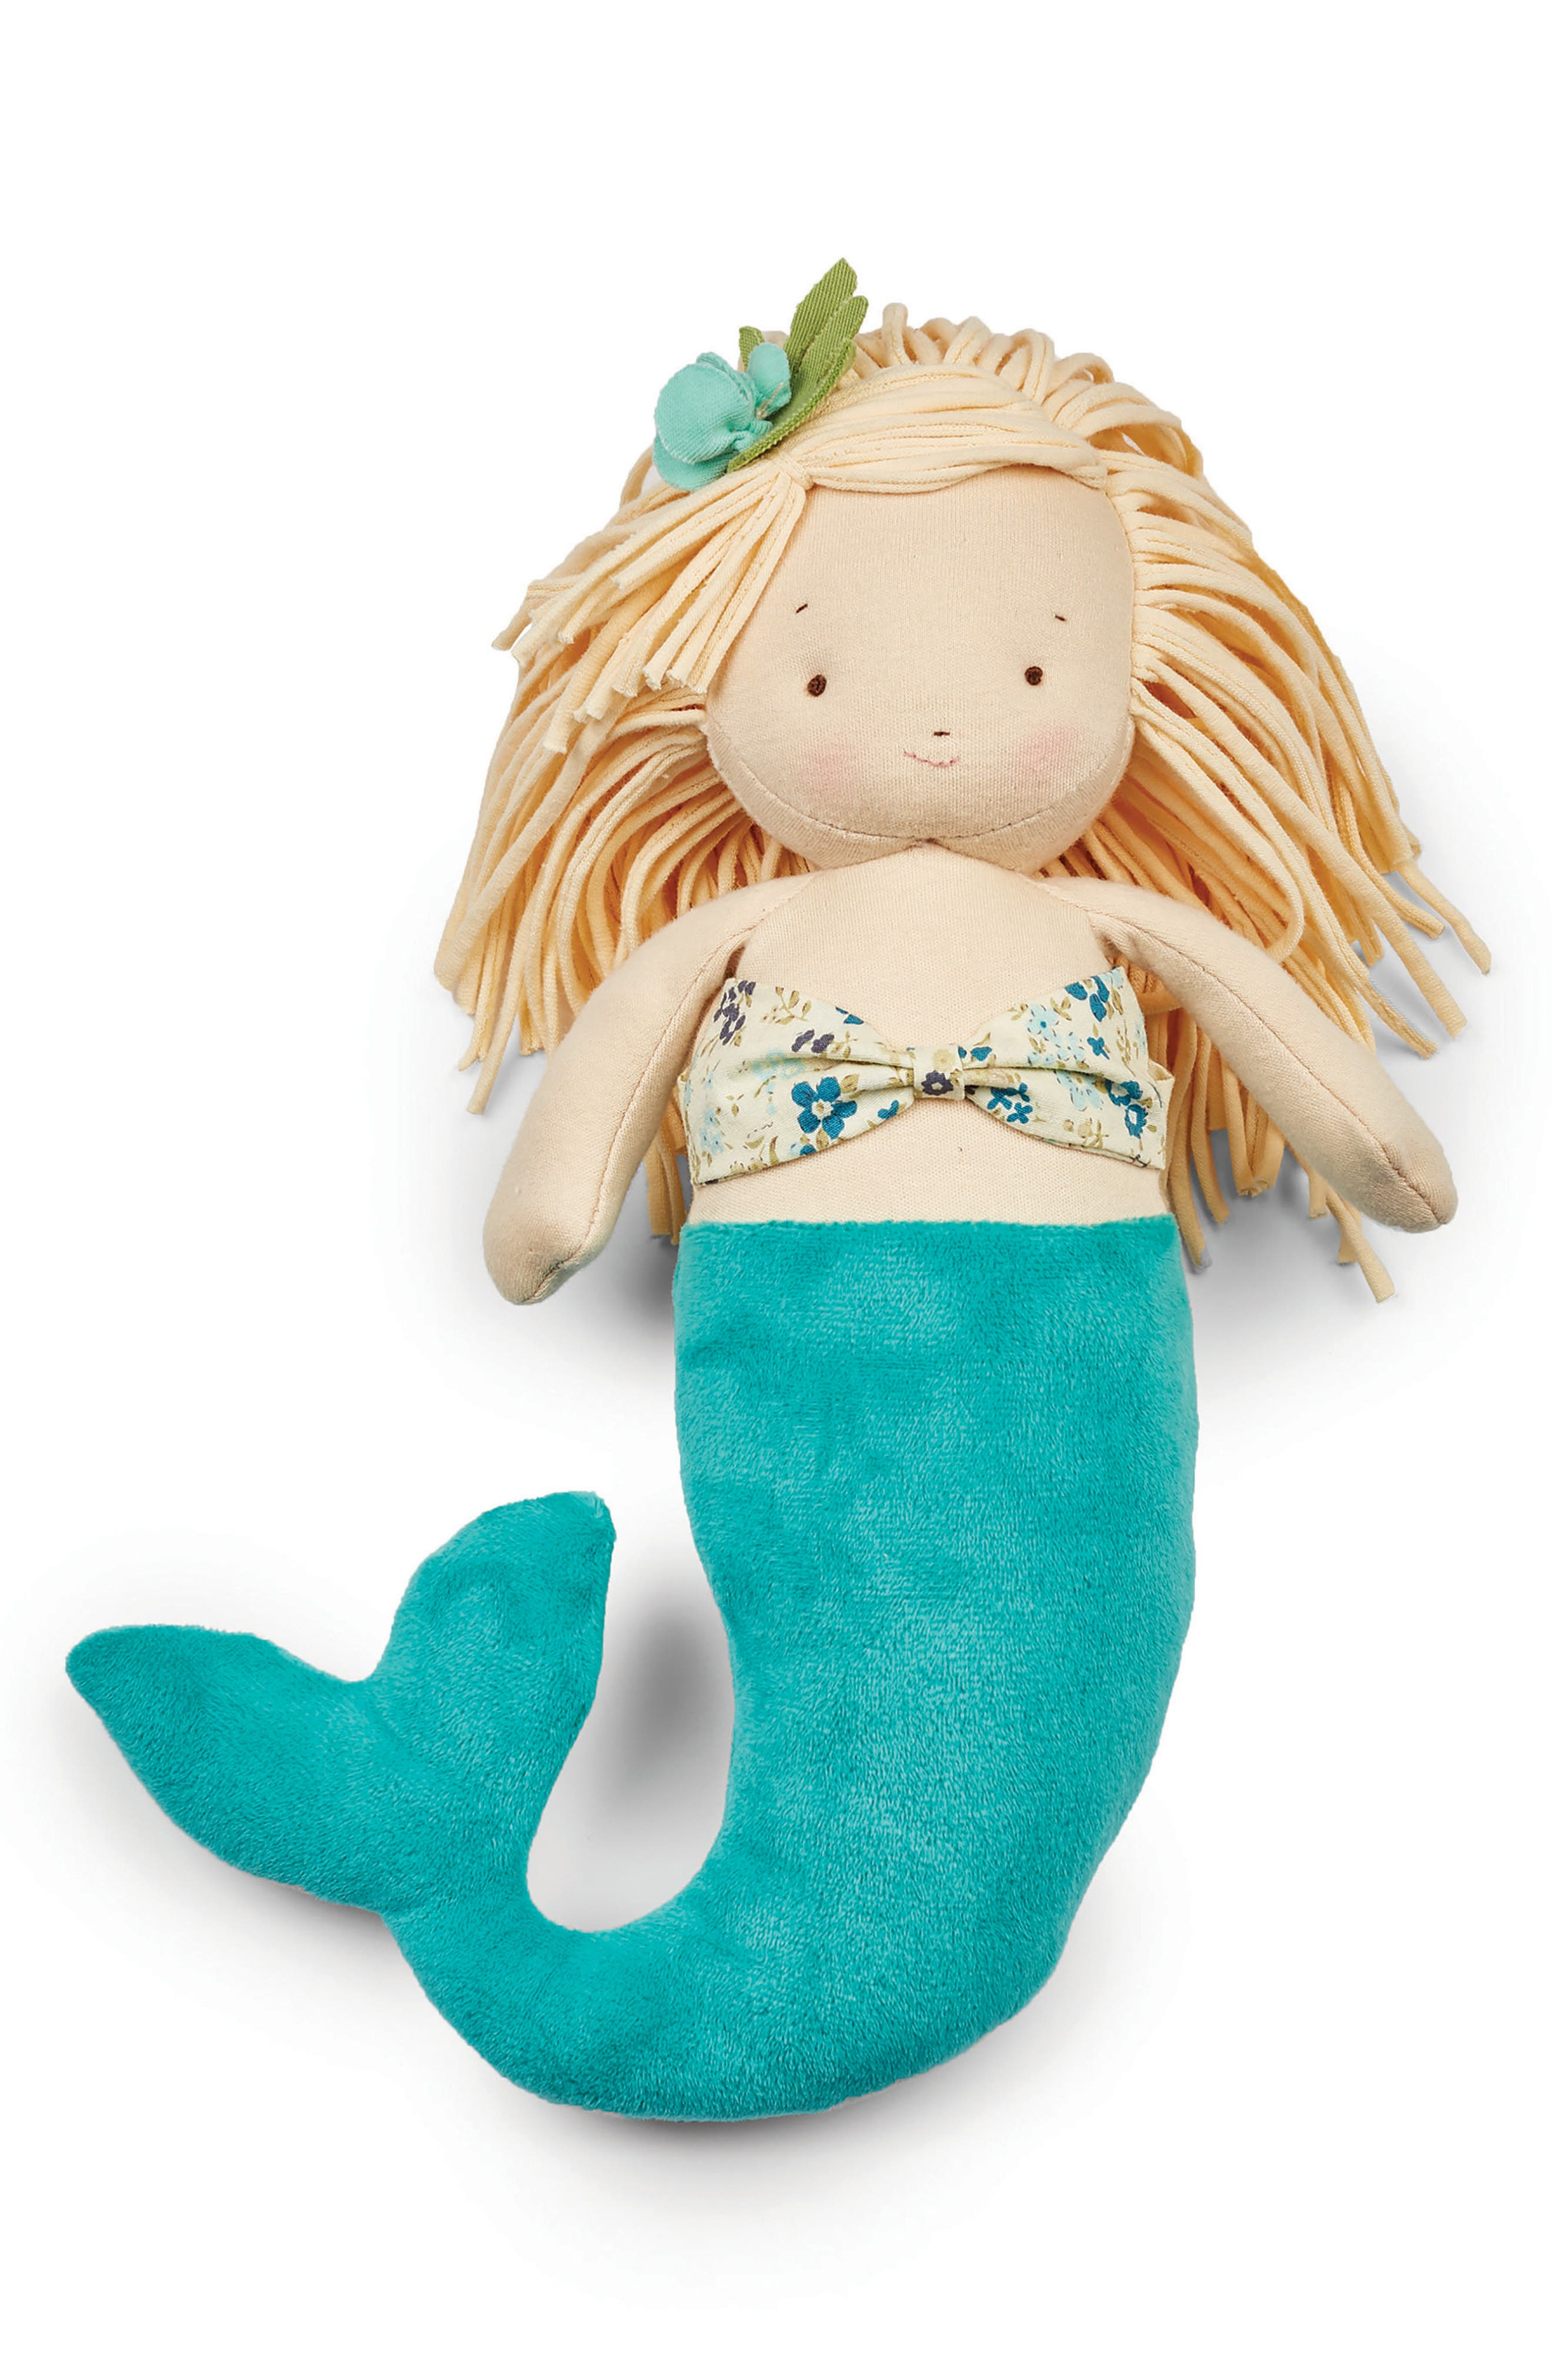 El-Sea Mermaid Doll,                             Main thumbnail 1, color,                             Beige